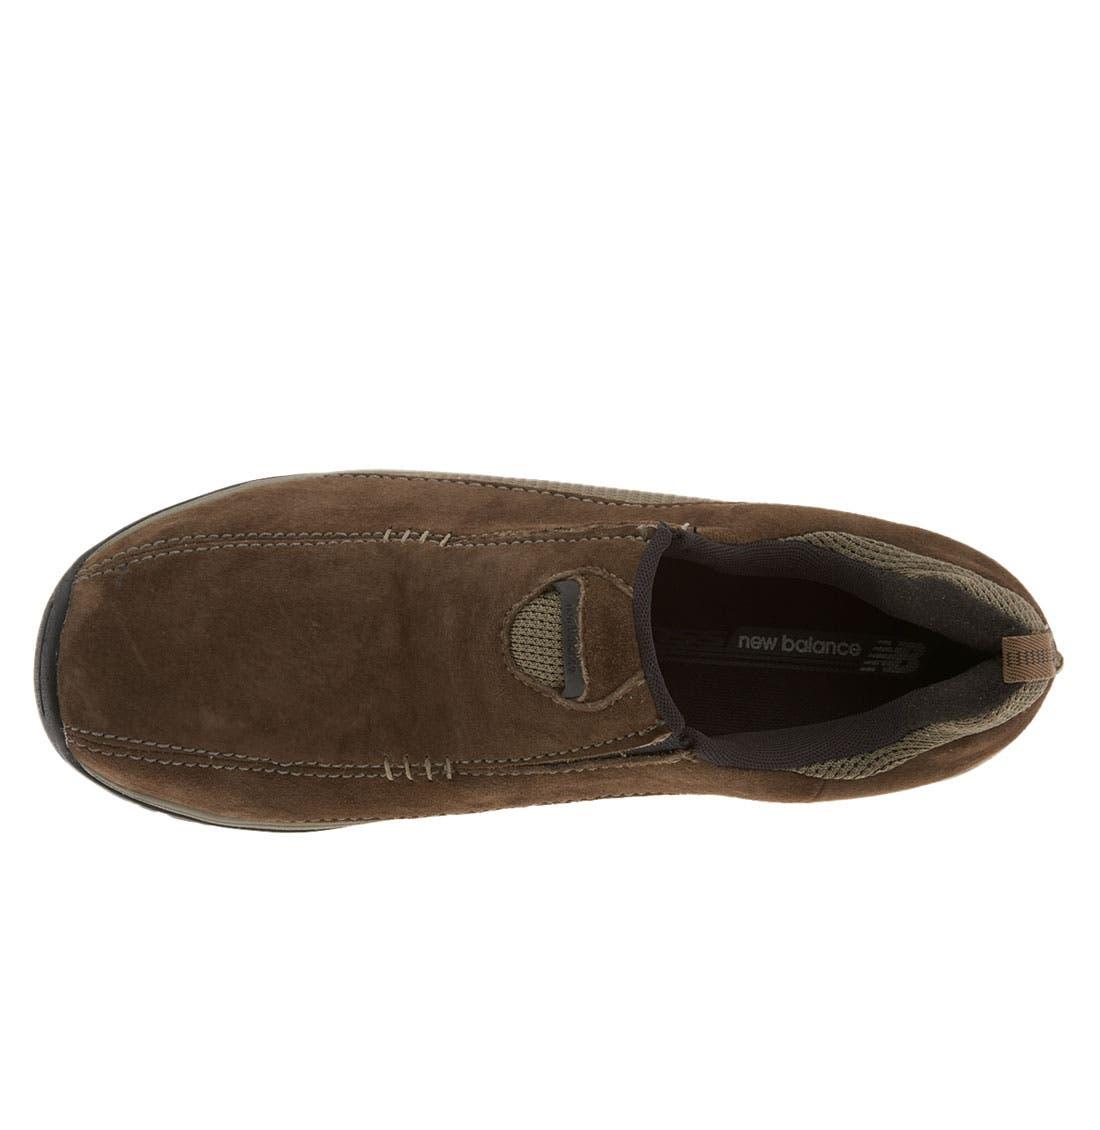 NEW BALANCE,                             '755' Walking Shoe,                             Alternate thumbnail 3, color,                             225